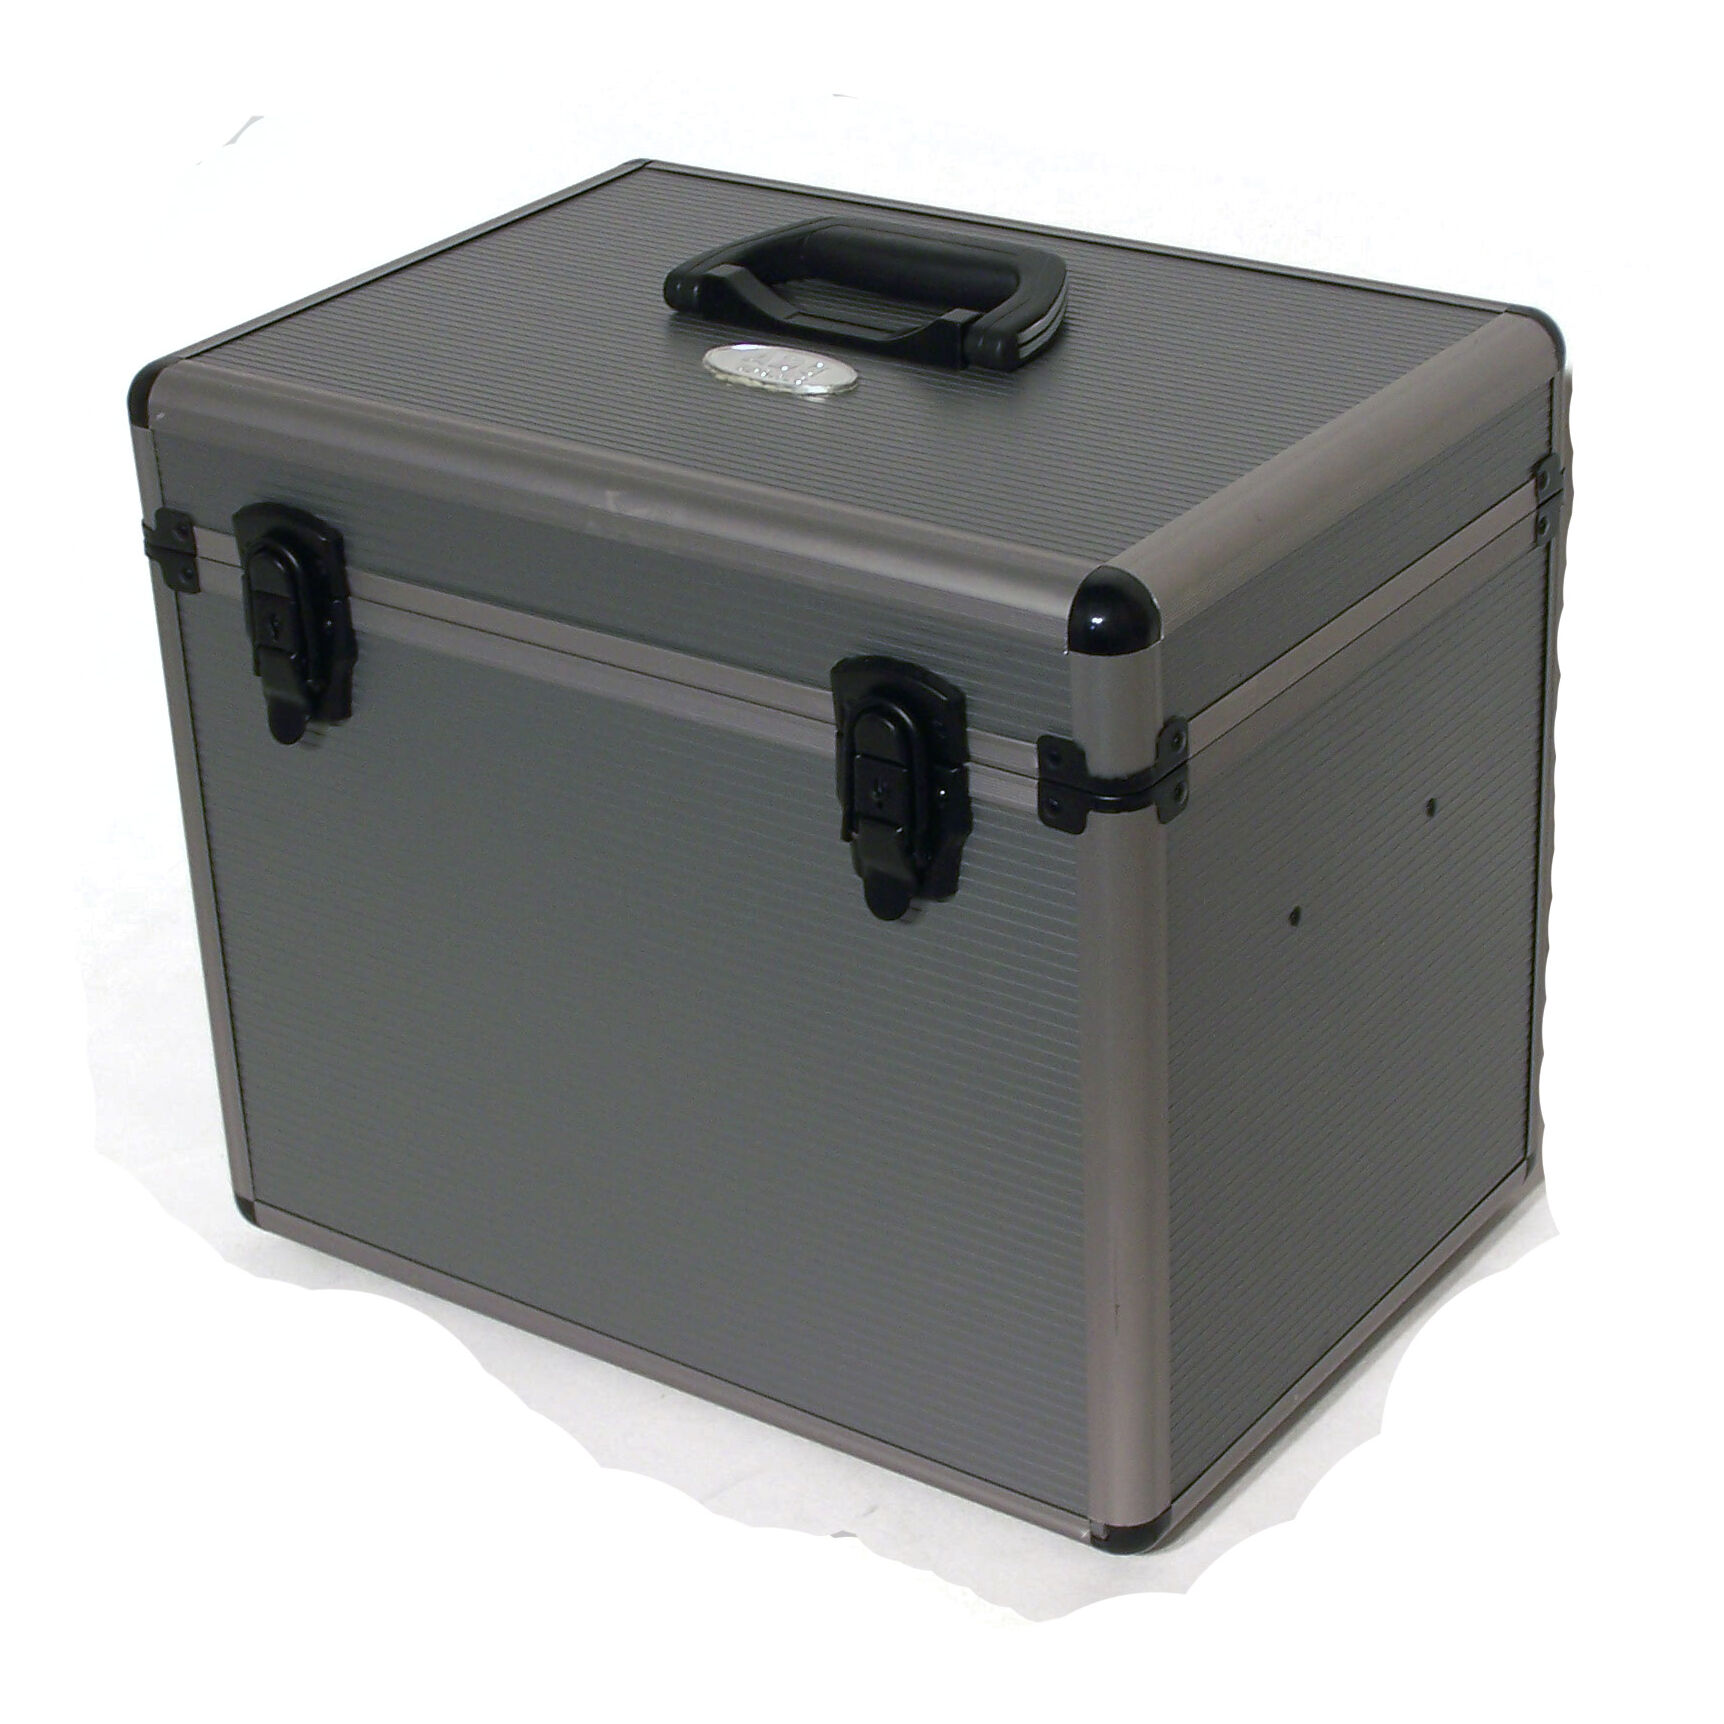 protosen product meets 1 rh protosen blogspot com ADG Sports Pistol Case ADG Sports Safe